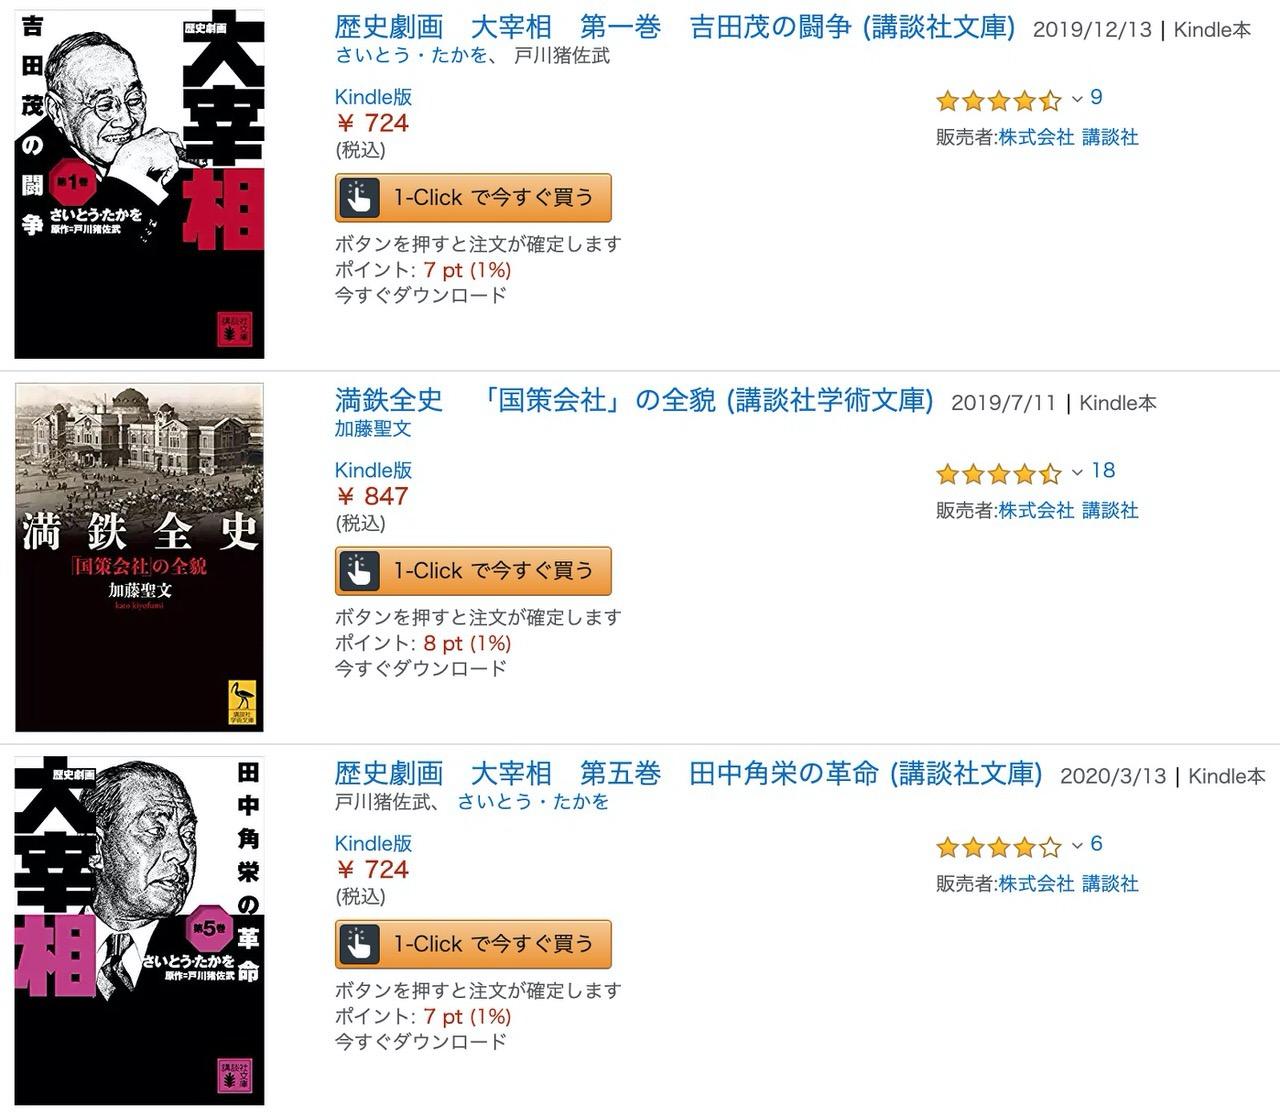 【Kindleセール】歴史劇画 大宰相、満鉄全史、東京裁判など「もっと知りたい日本の近代史フェア」(5/21まで)